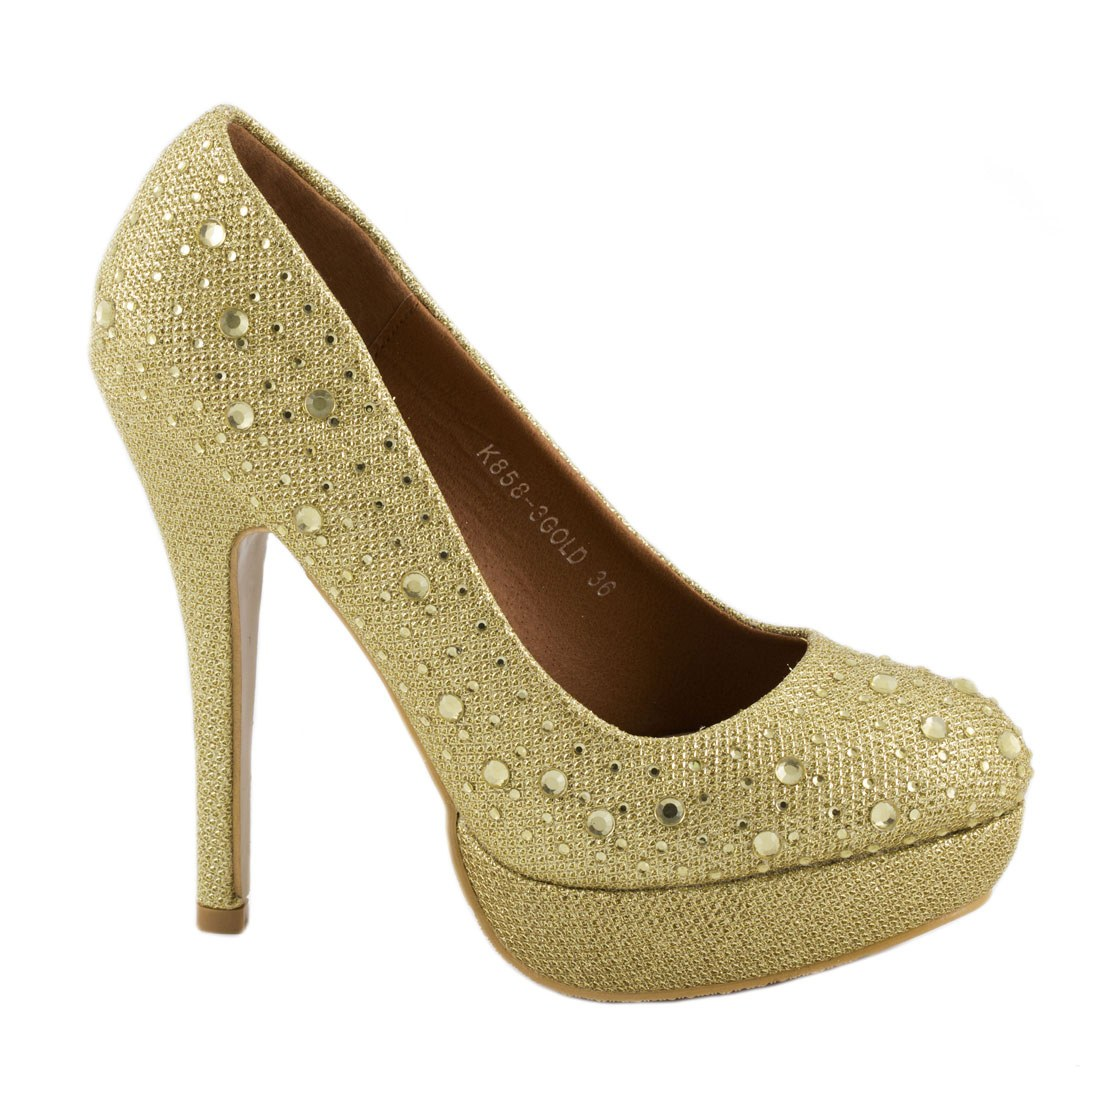 Pantofi dama cu strasuri K858-3-GOLD